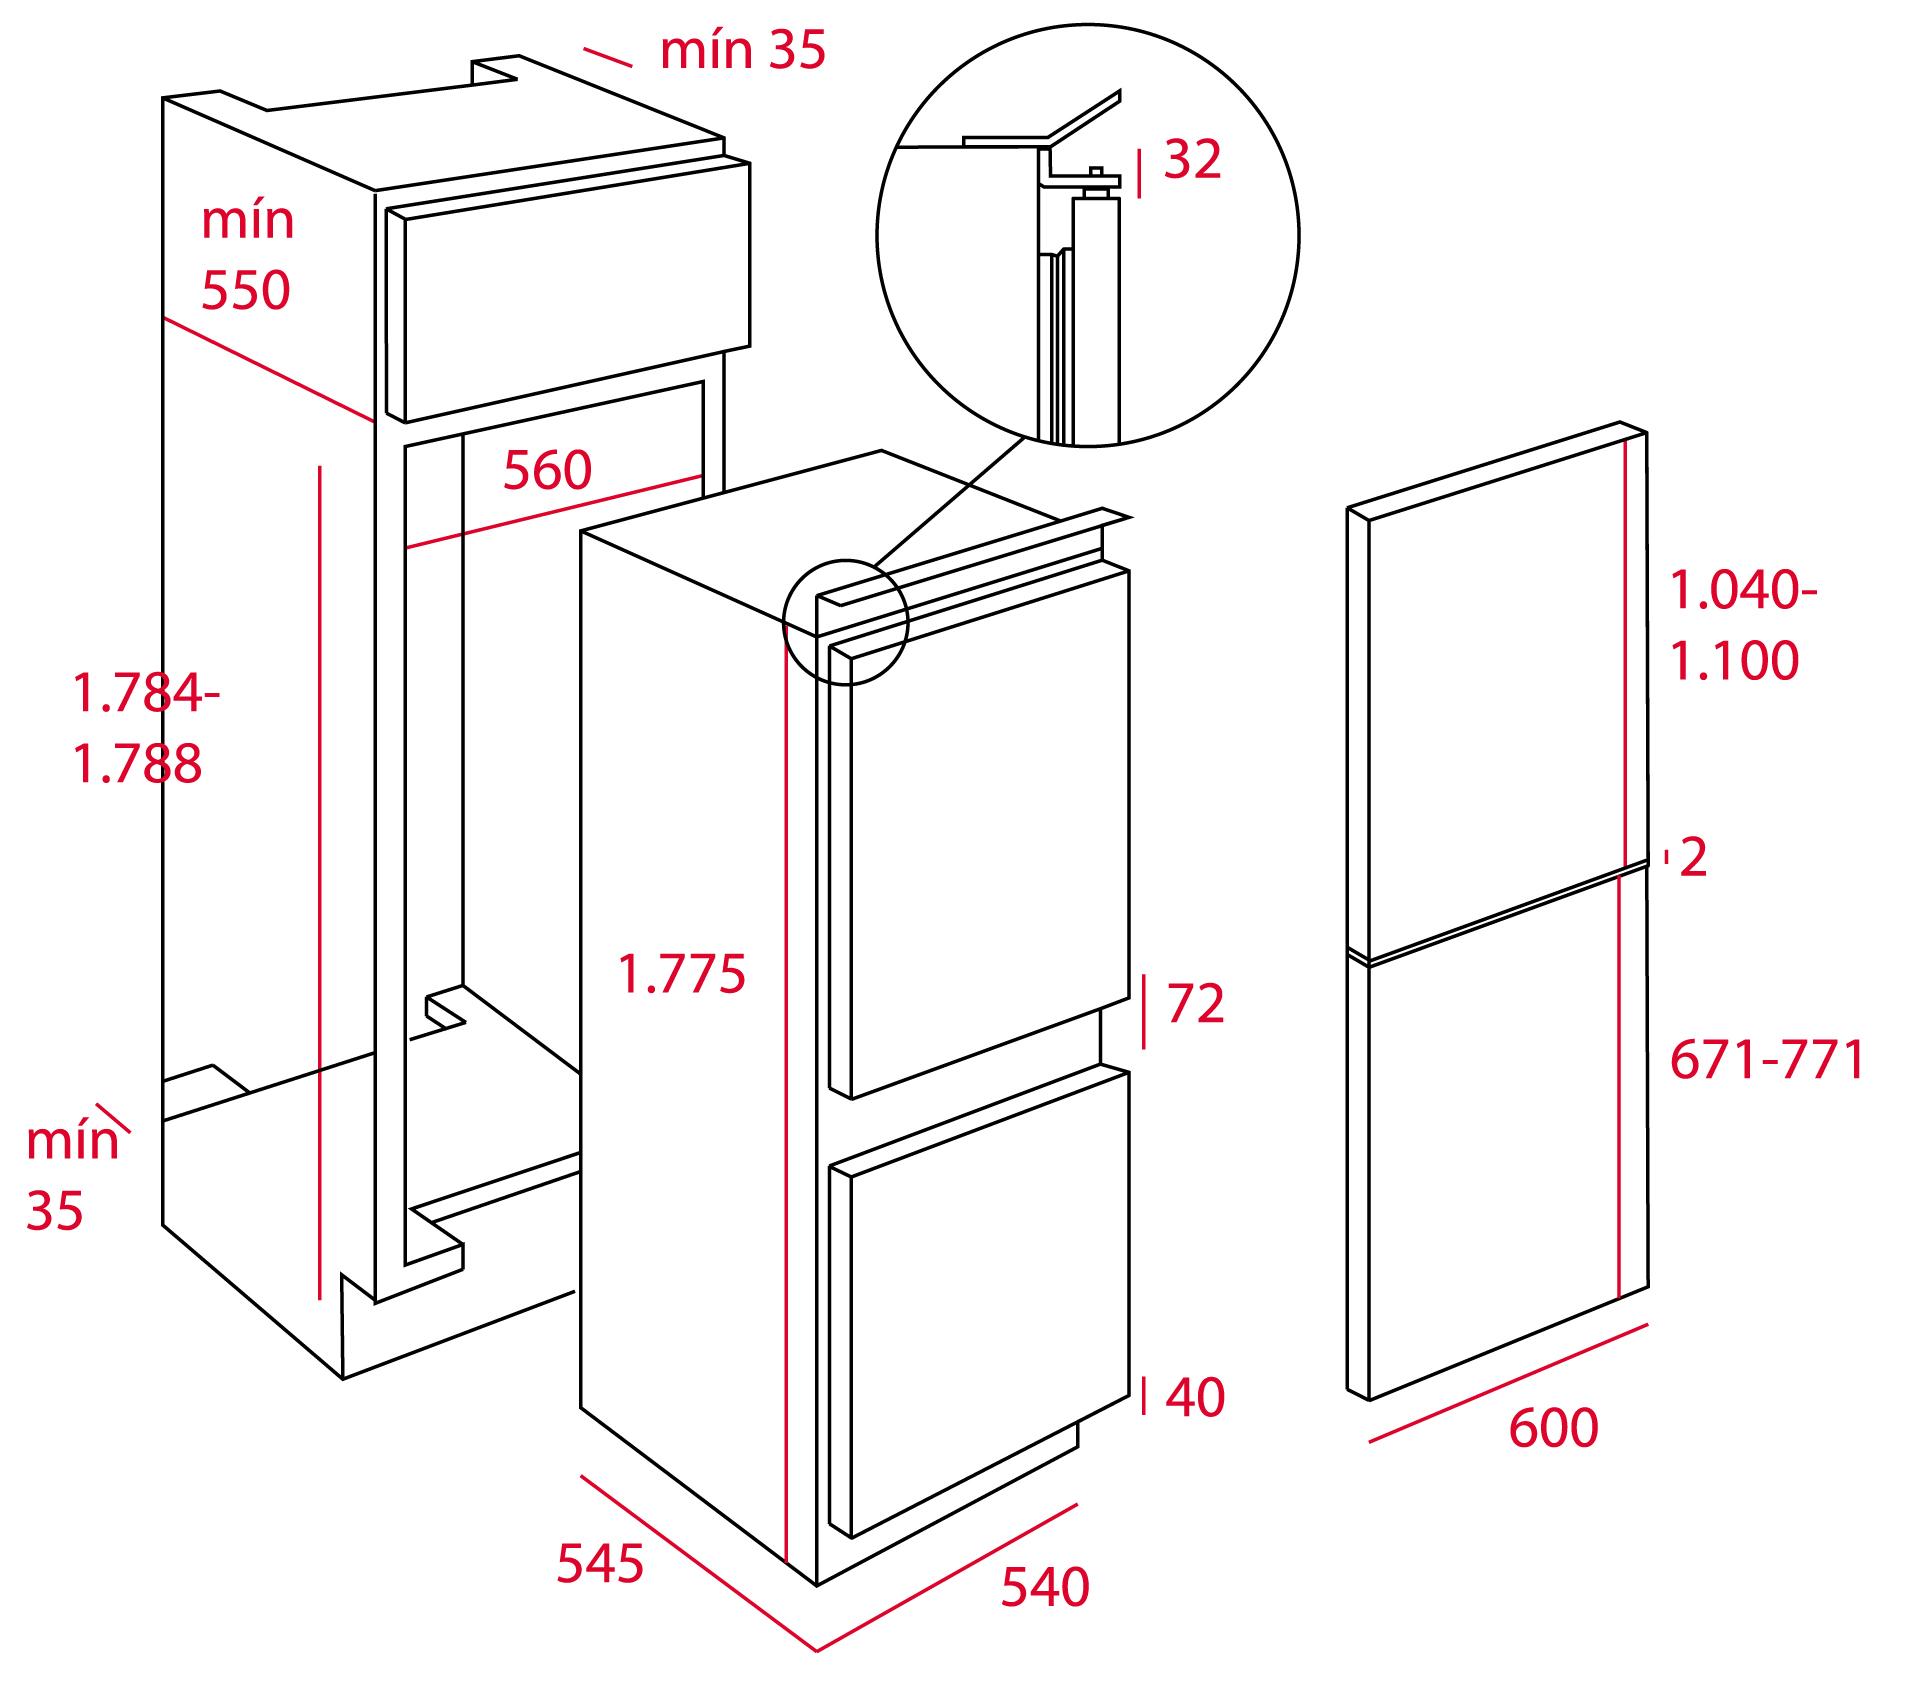 frigorífico-ci3-350-nf-blanco-40634571-foto-frontal-abierto-web.jpg_product